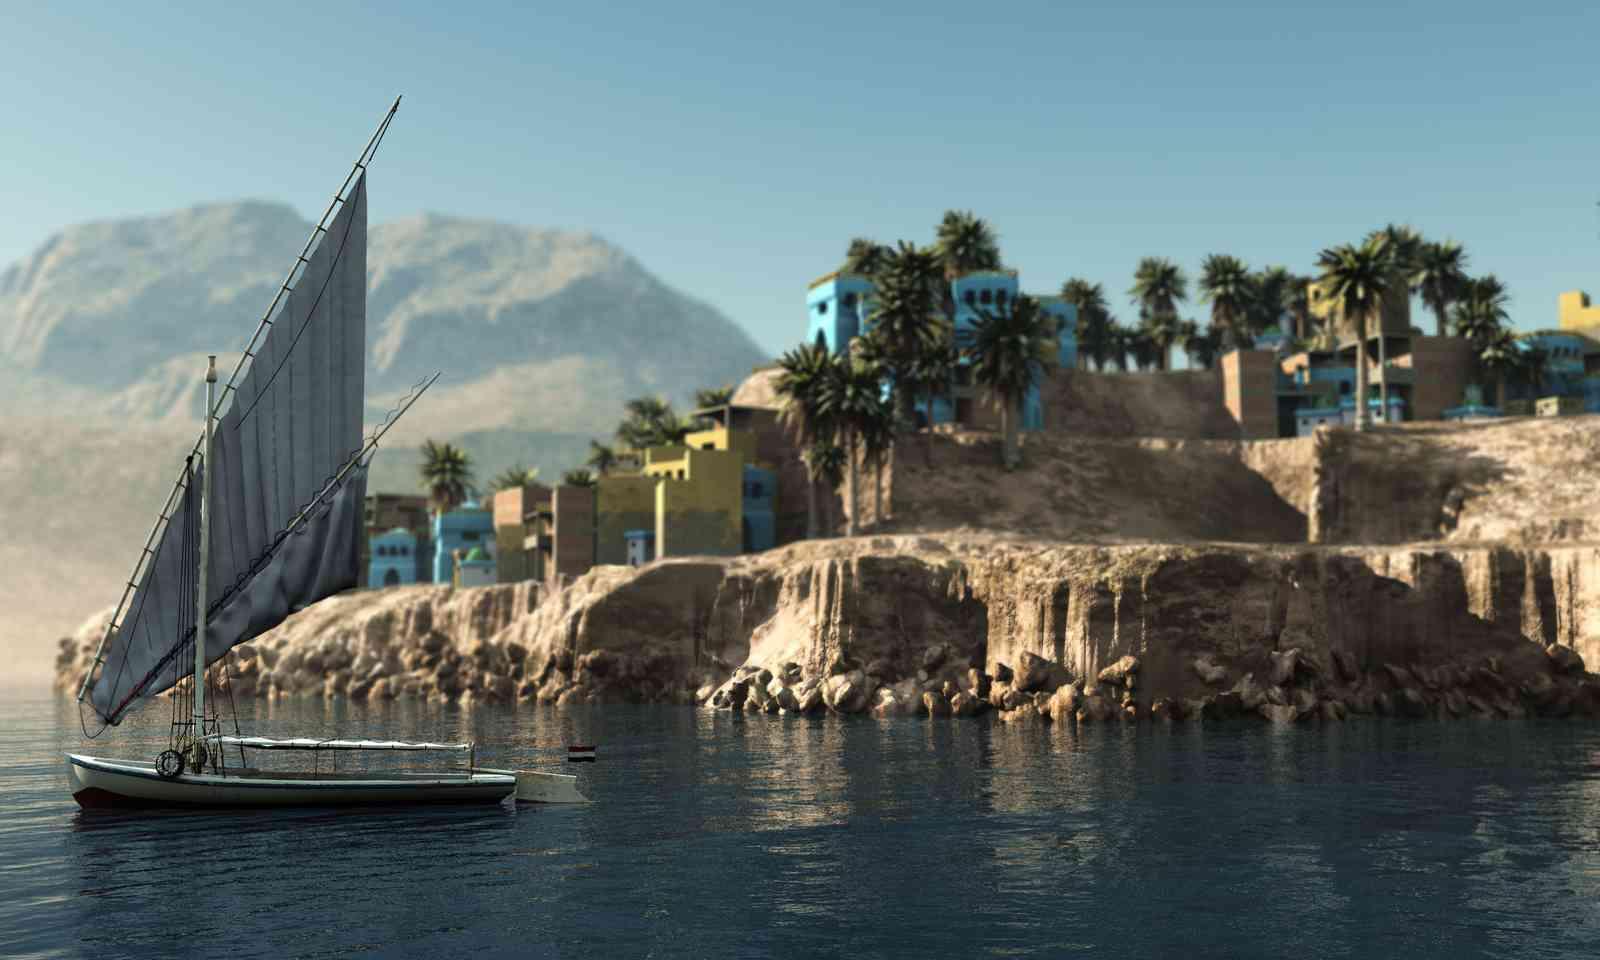 Felucca on the Nile (Shutterstock.com)